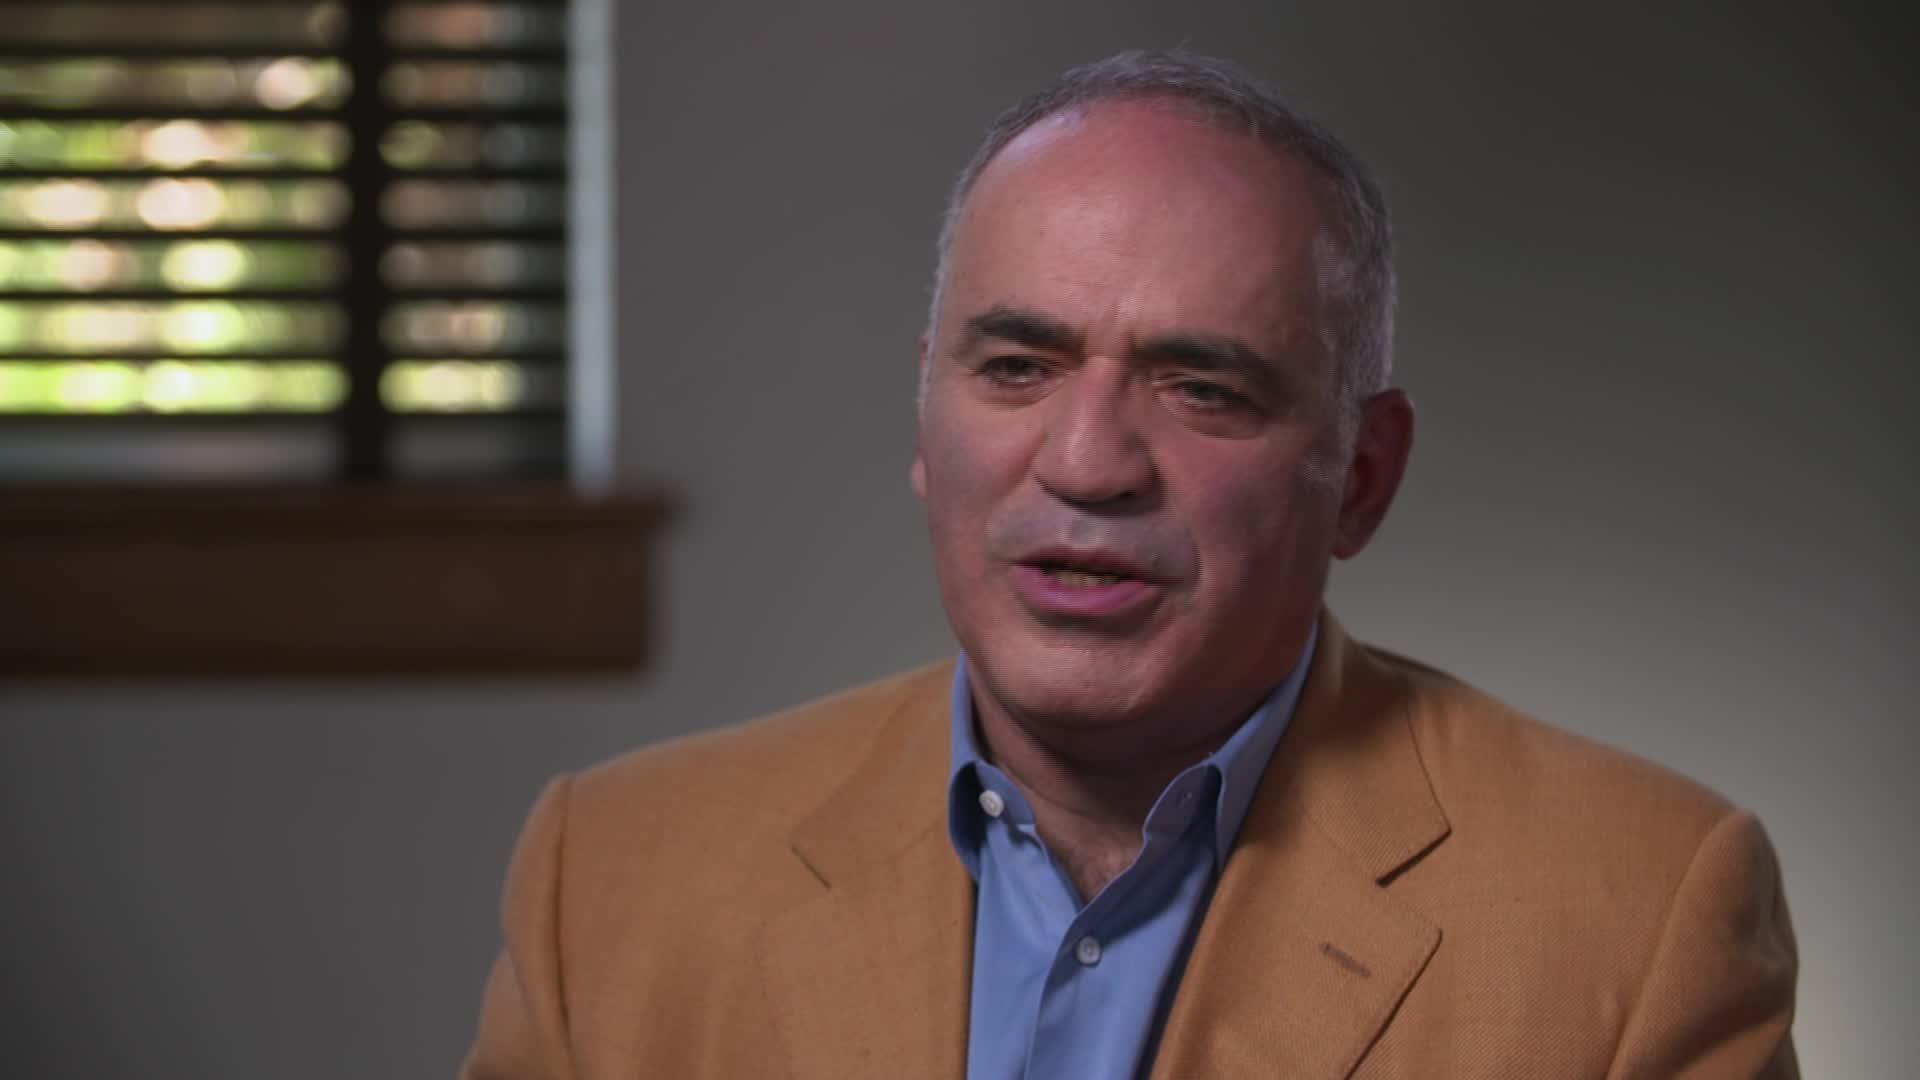 Garry Kasparov Talks Chess, Tech, Trump and Putin